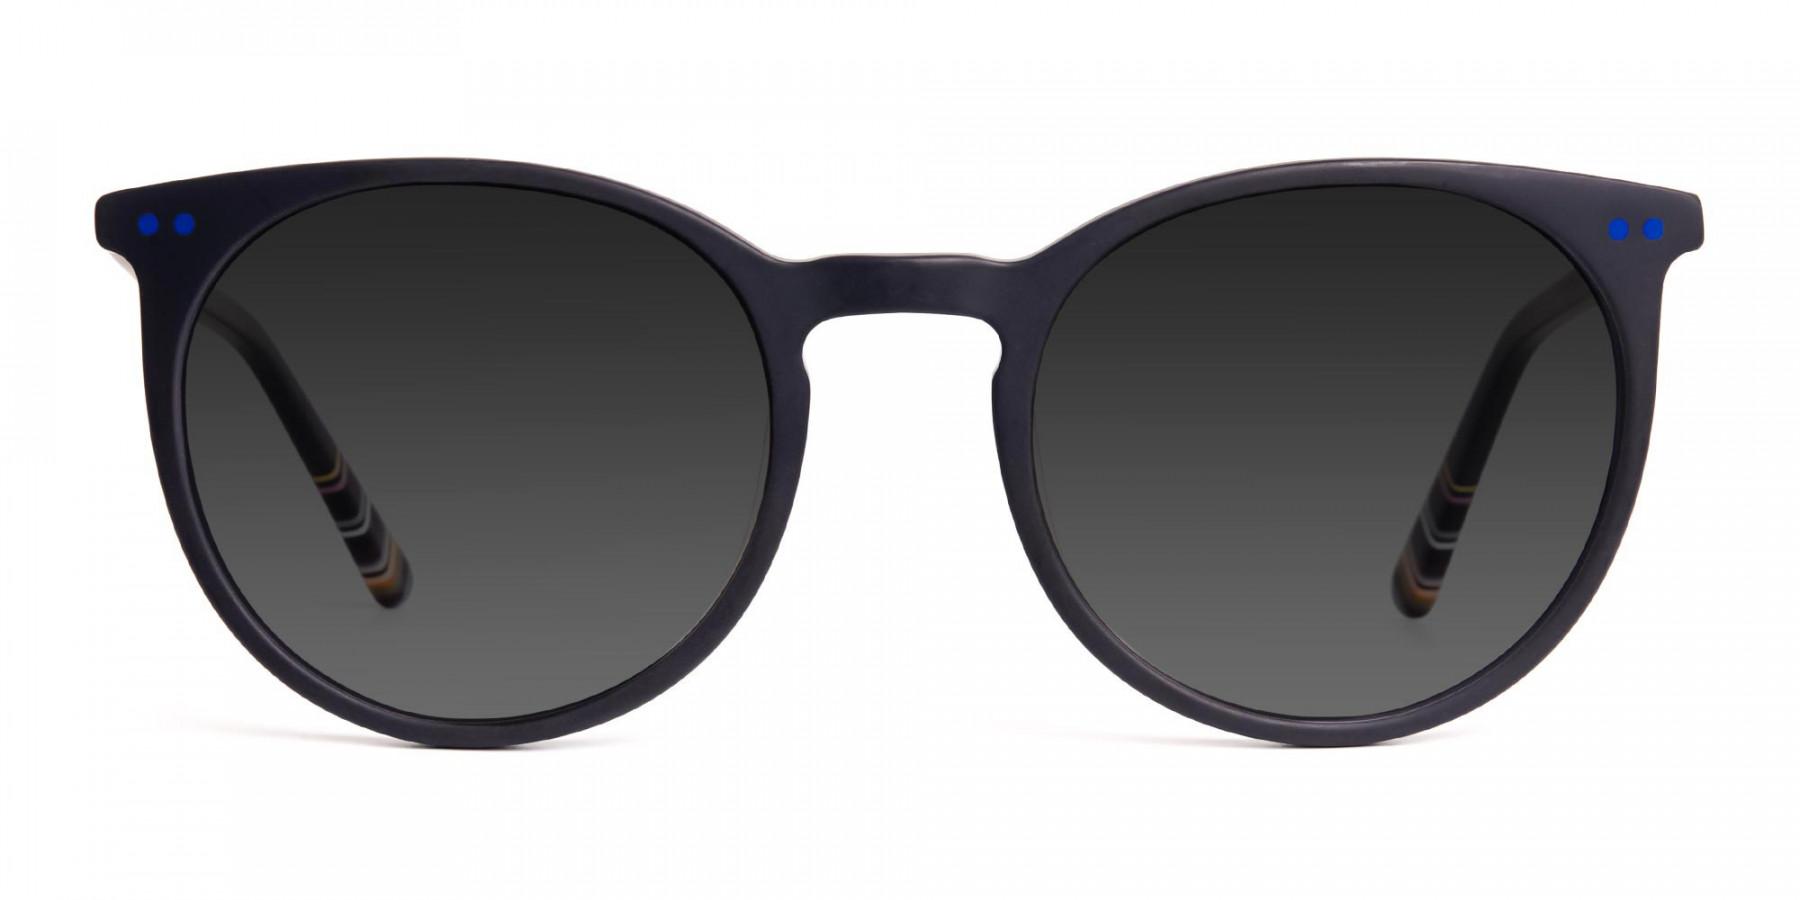 matte-black-designer-indigo-blue-grey-tinted-sunglasses-frame-3